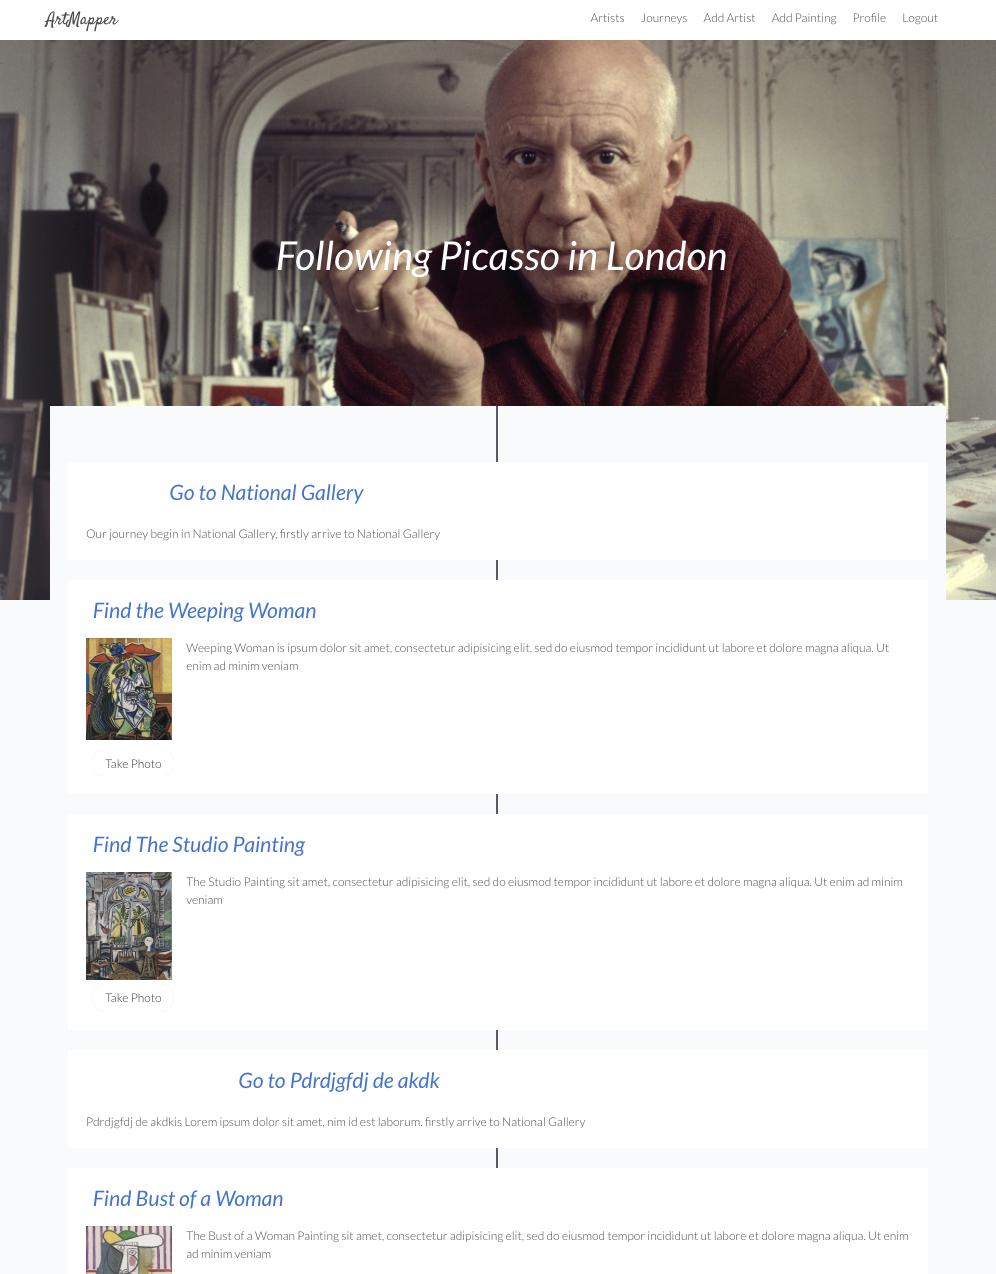 artmapper journey page